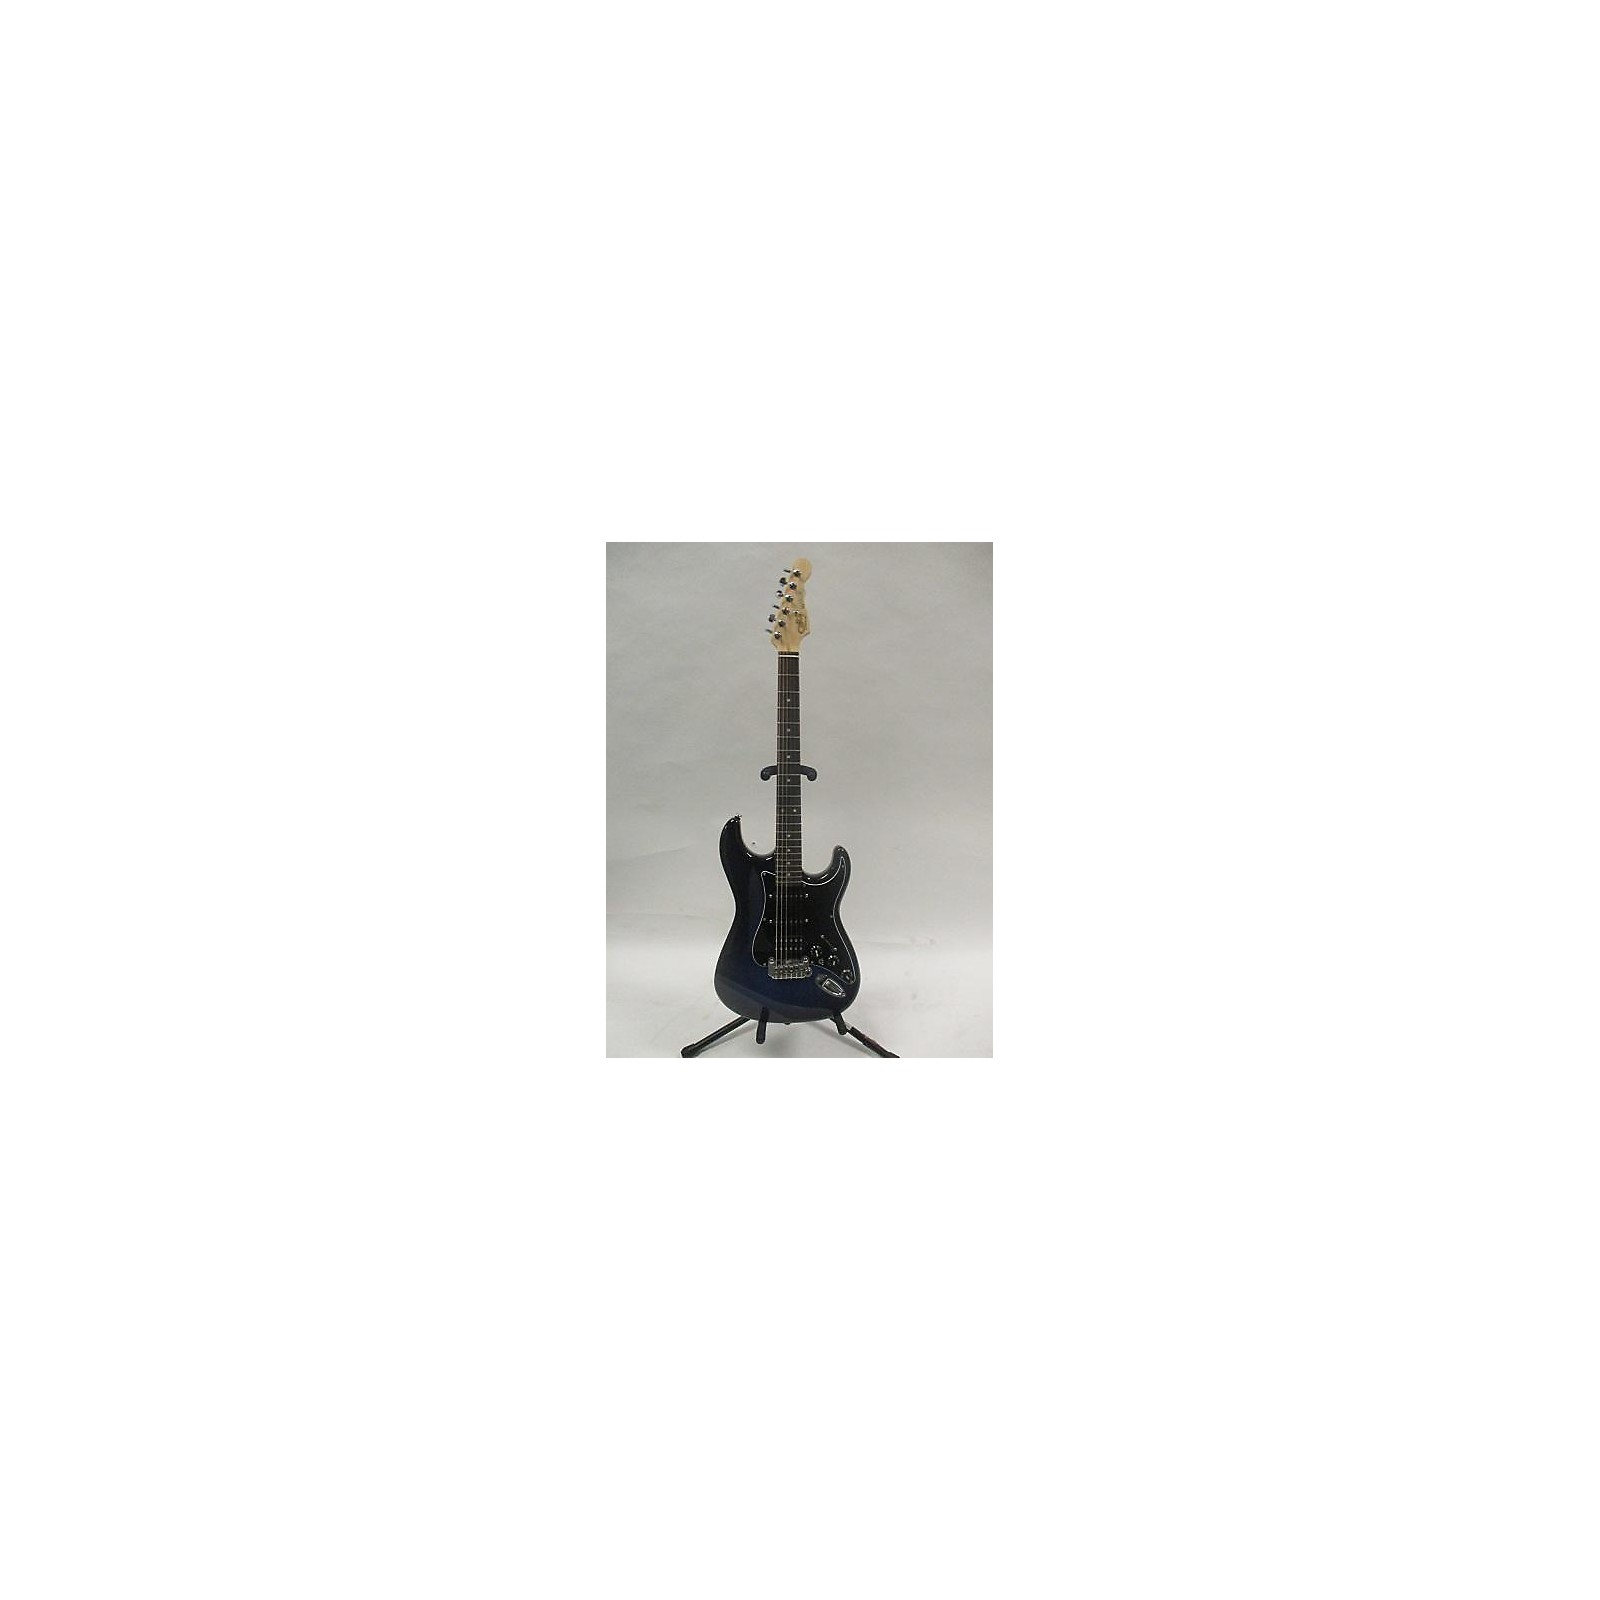 G&L Legacy HSS Solid Body Electric Guitar